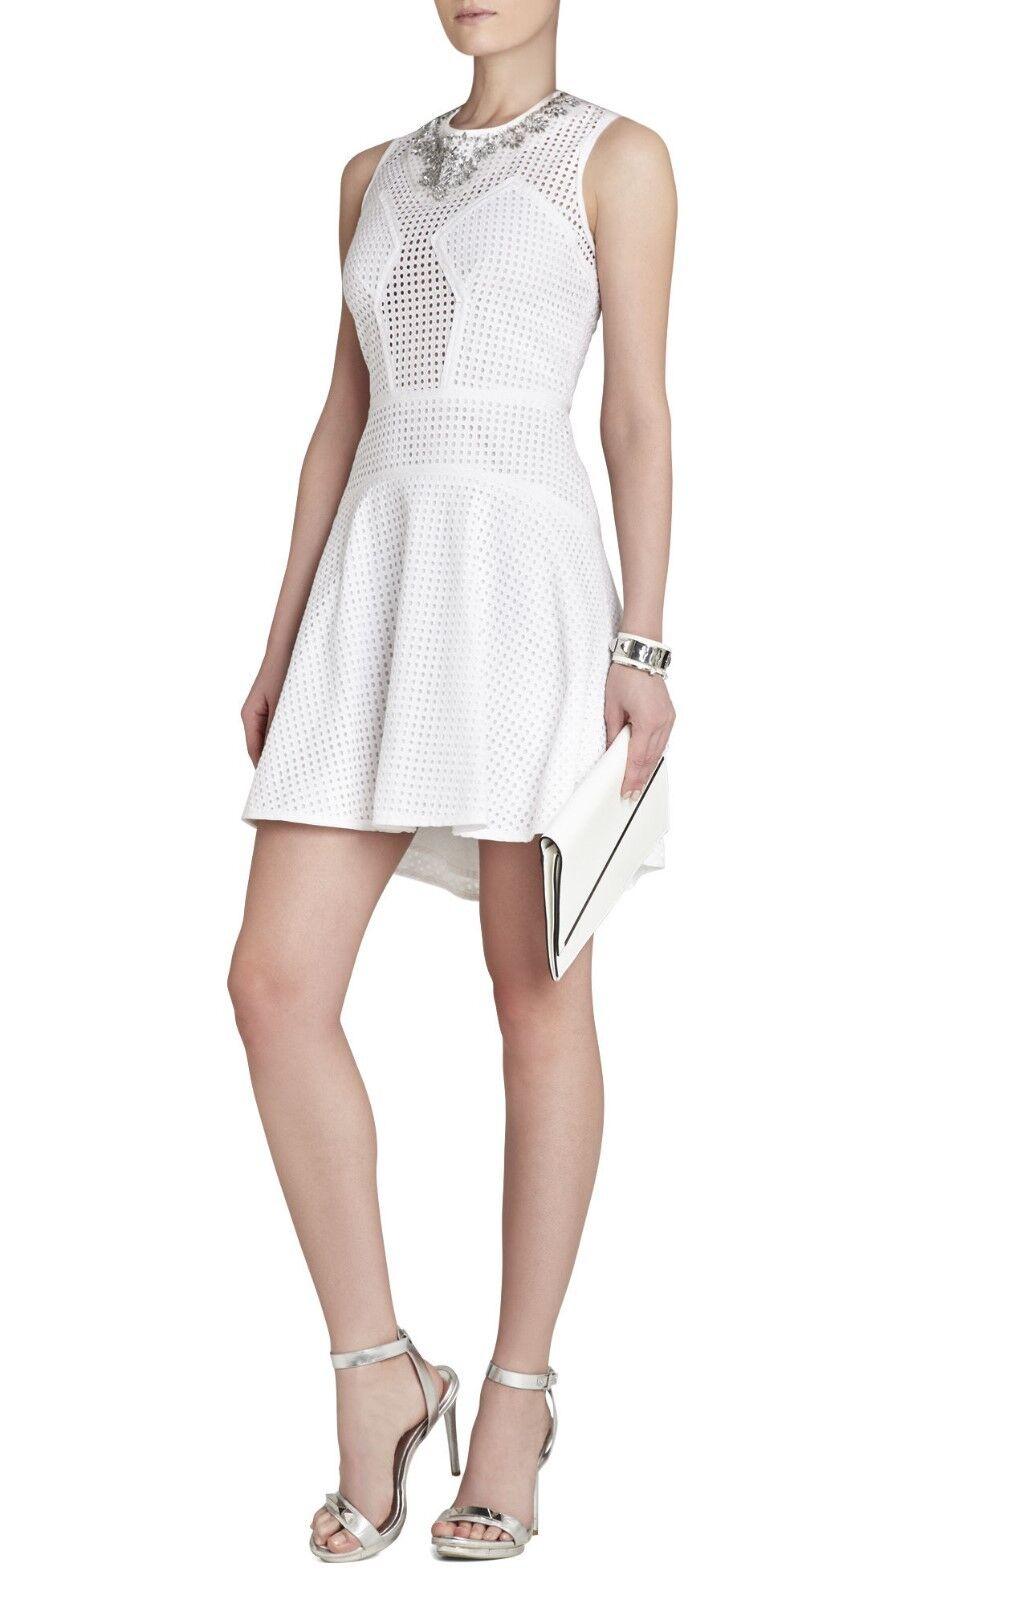 da2aa2fb0e NEW BCBGMAXAZRIA WHITE SLEEVELESS DRESS XLB67A18 M956 SZ 4 SERINA EYELET  nhxlnp21025-Dresses